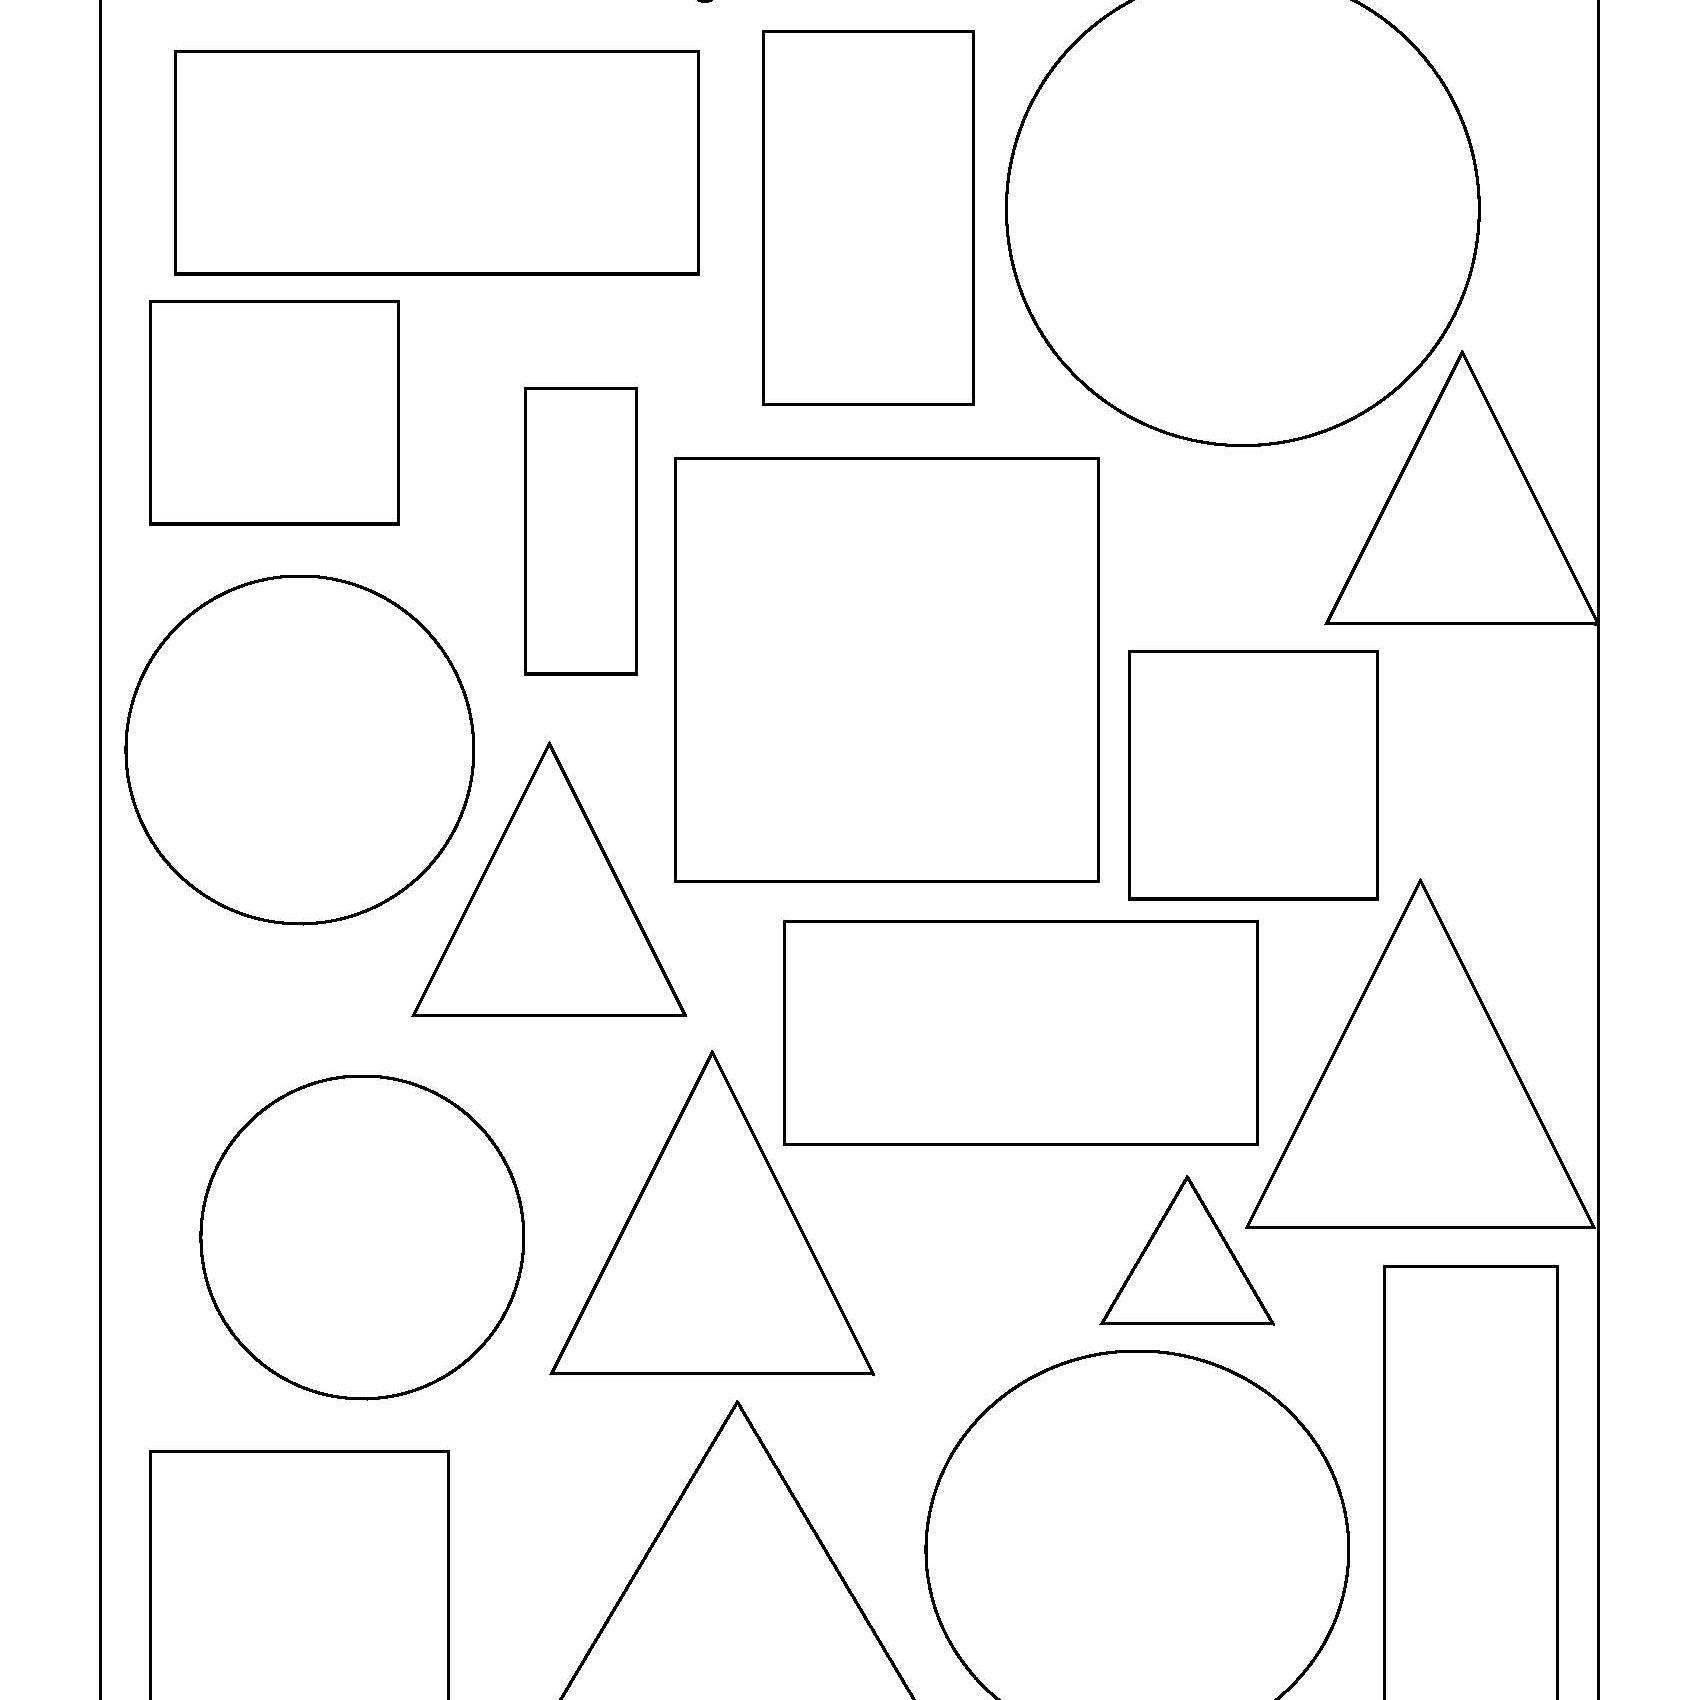 Oval Learning Worksheet